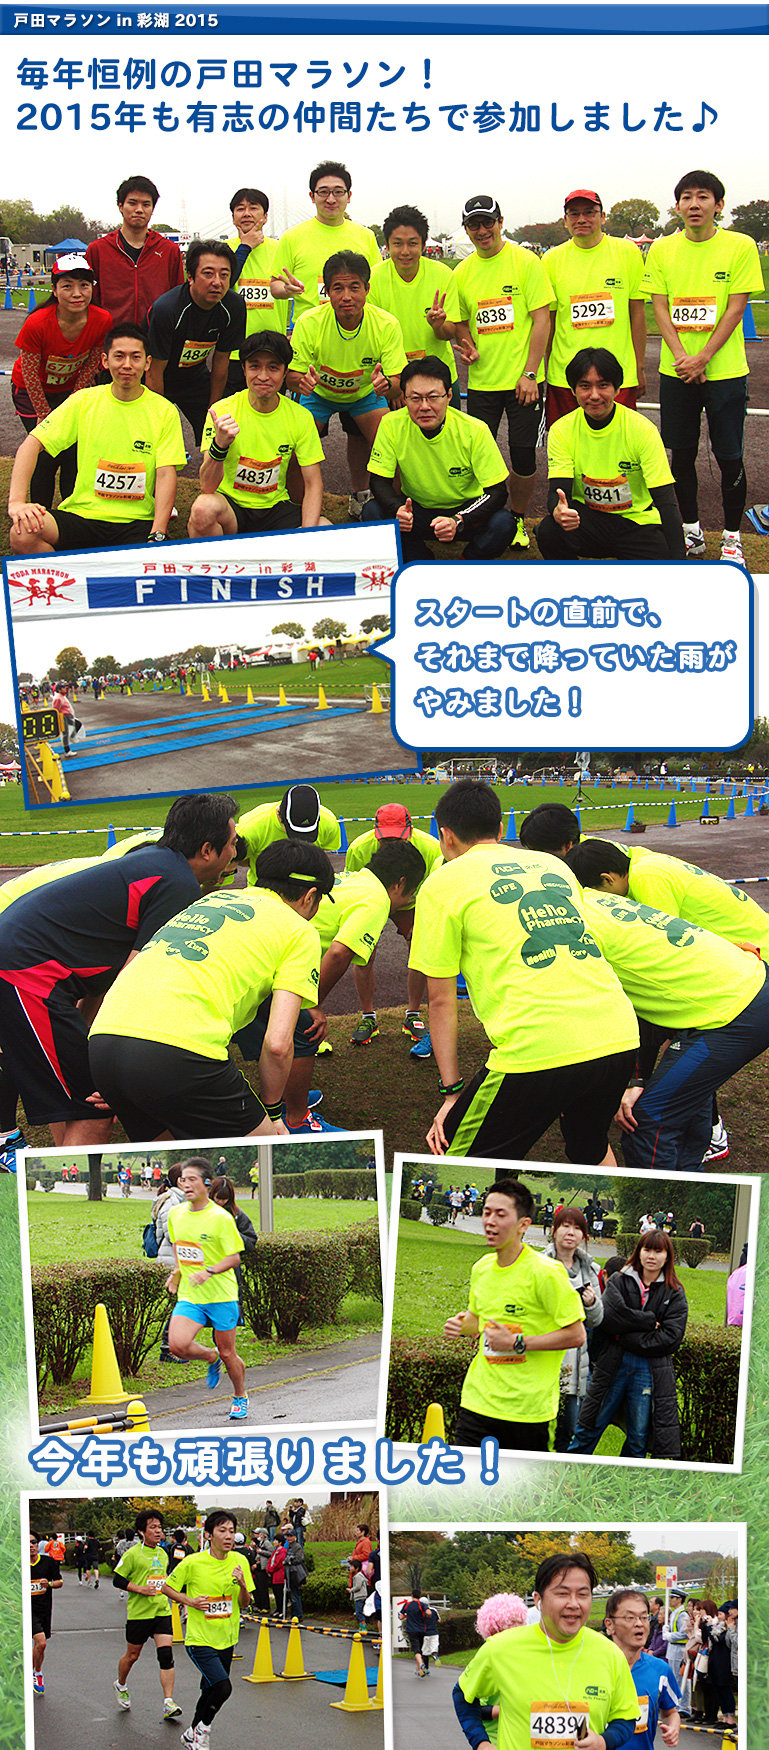 toda-run-2015_02.jpg